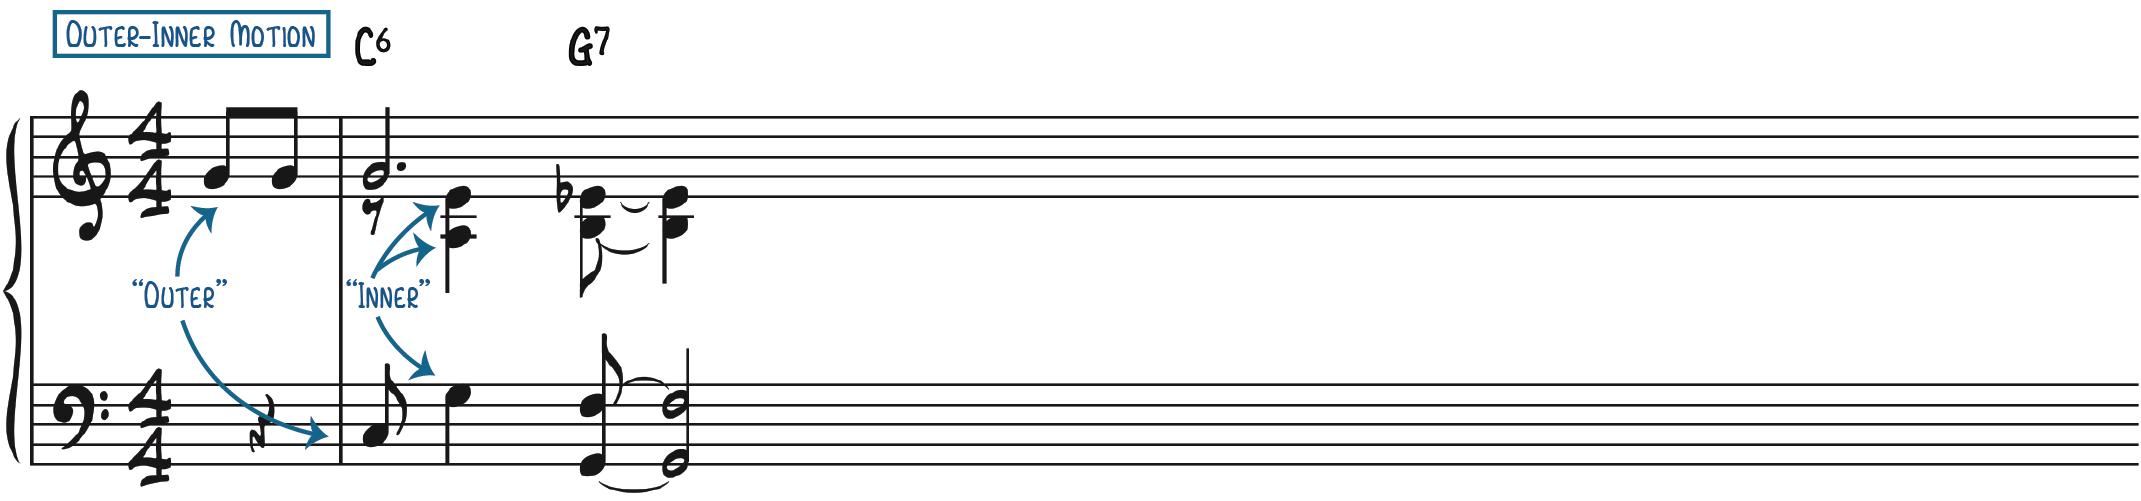 Jazz Piano Outer-Inner Motion on Winter Wonderland